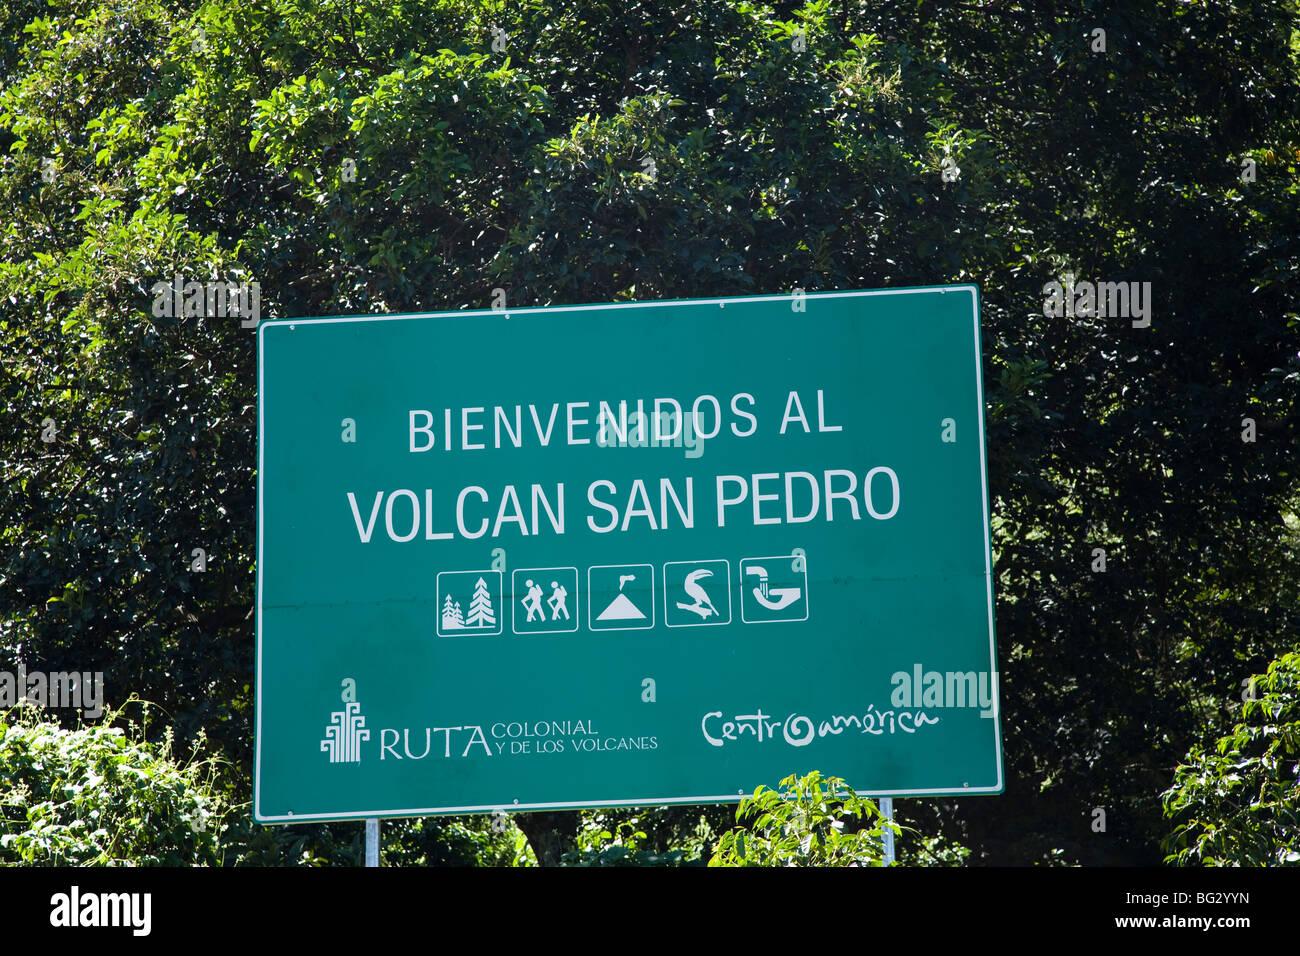 Volcano San Pedro at Lake Atitlan Guatemala. - Stock Image